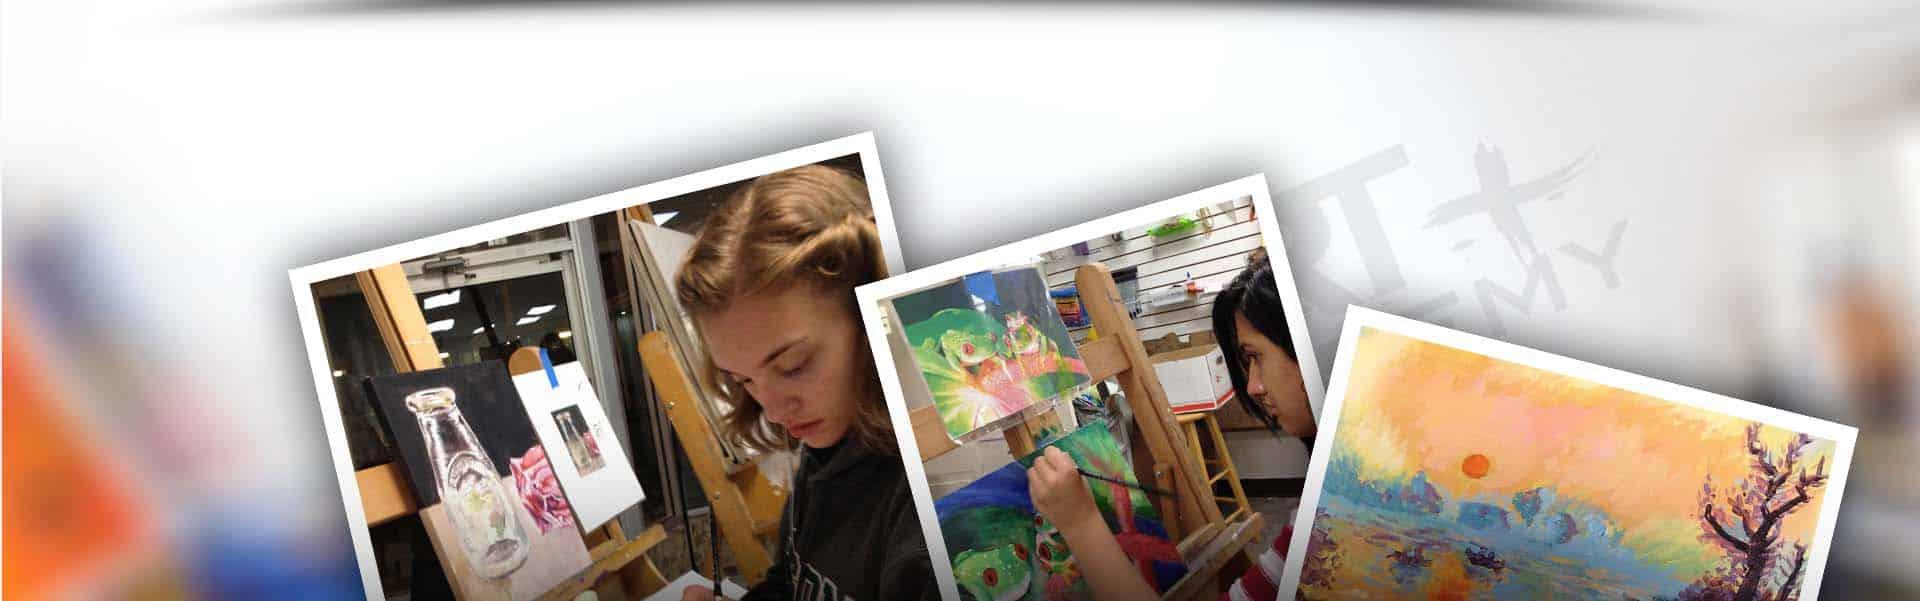 Craigslist Teen Art Classes 19